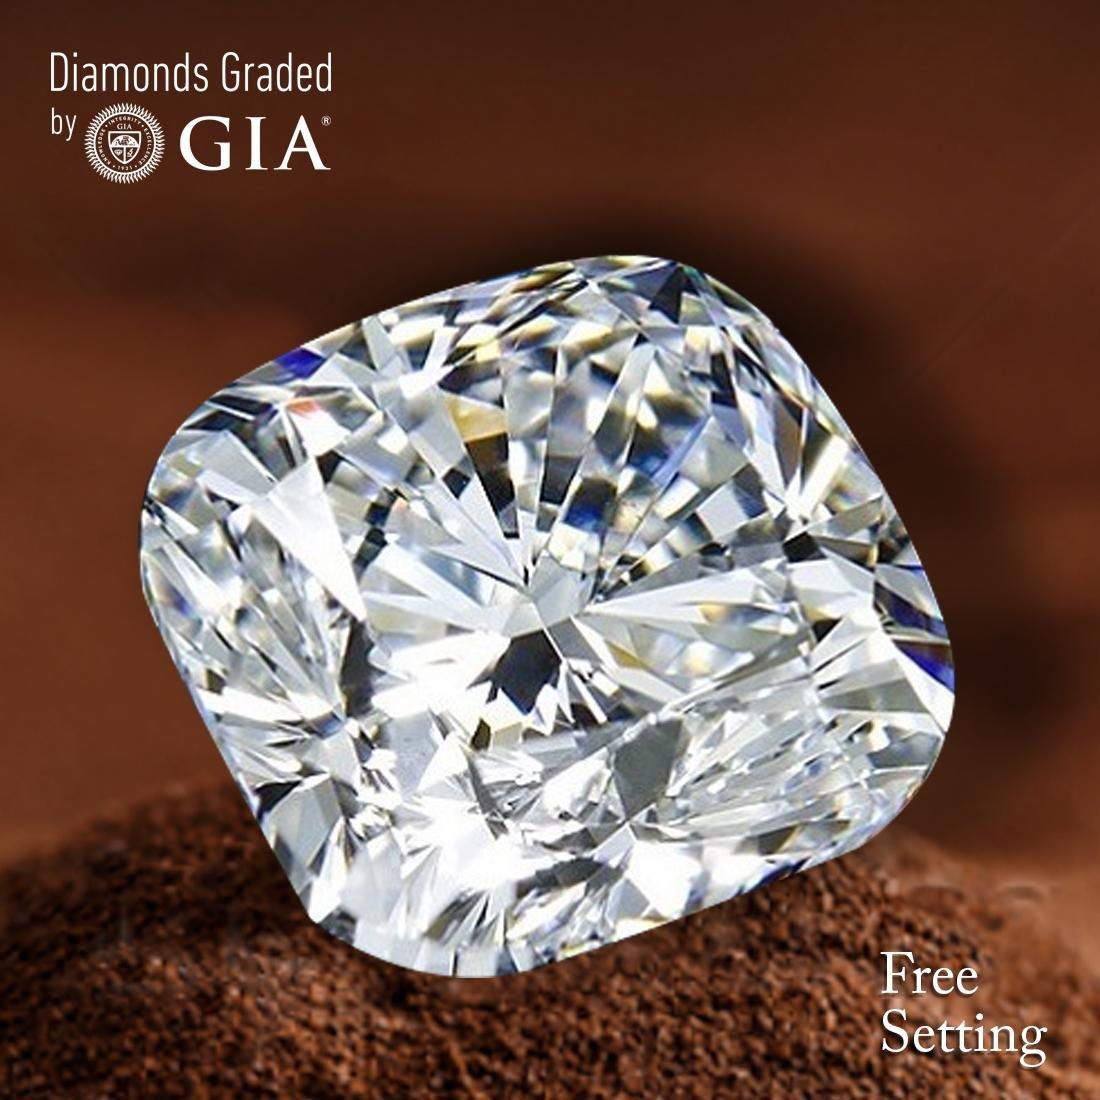 4.01 ct, Color F/VS1, Cushion cut Diamond